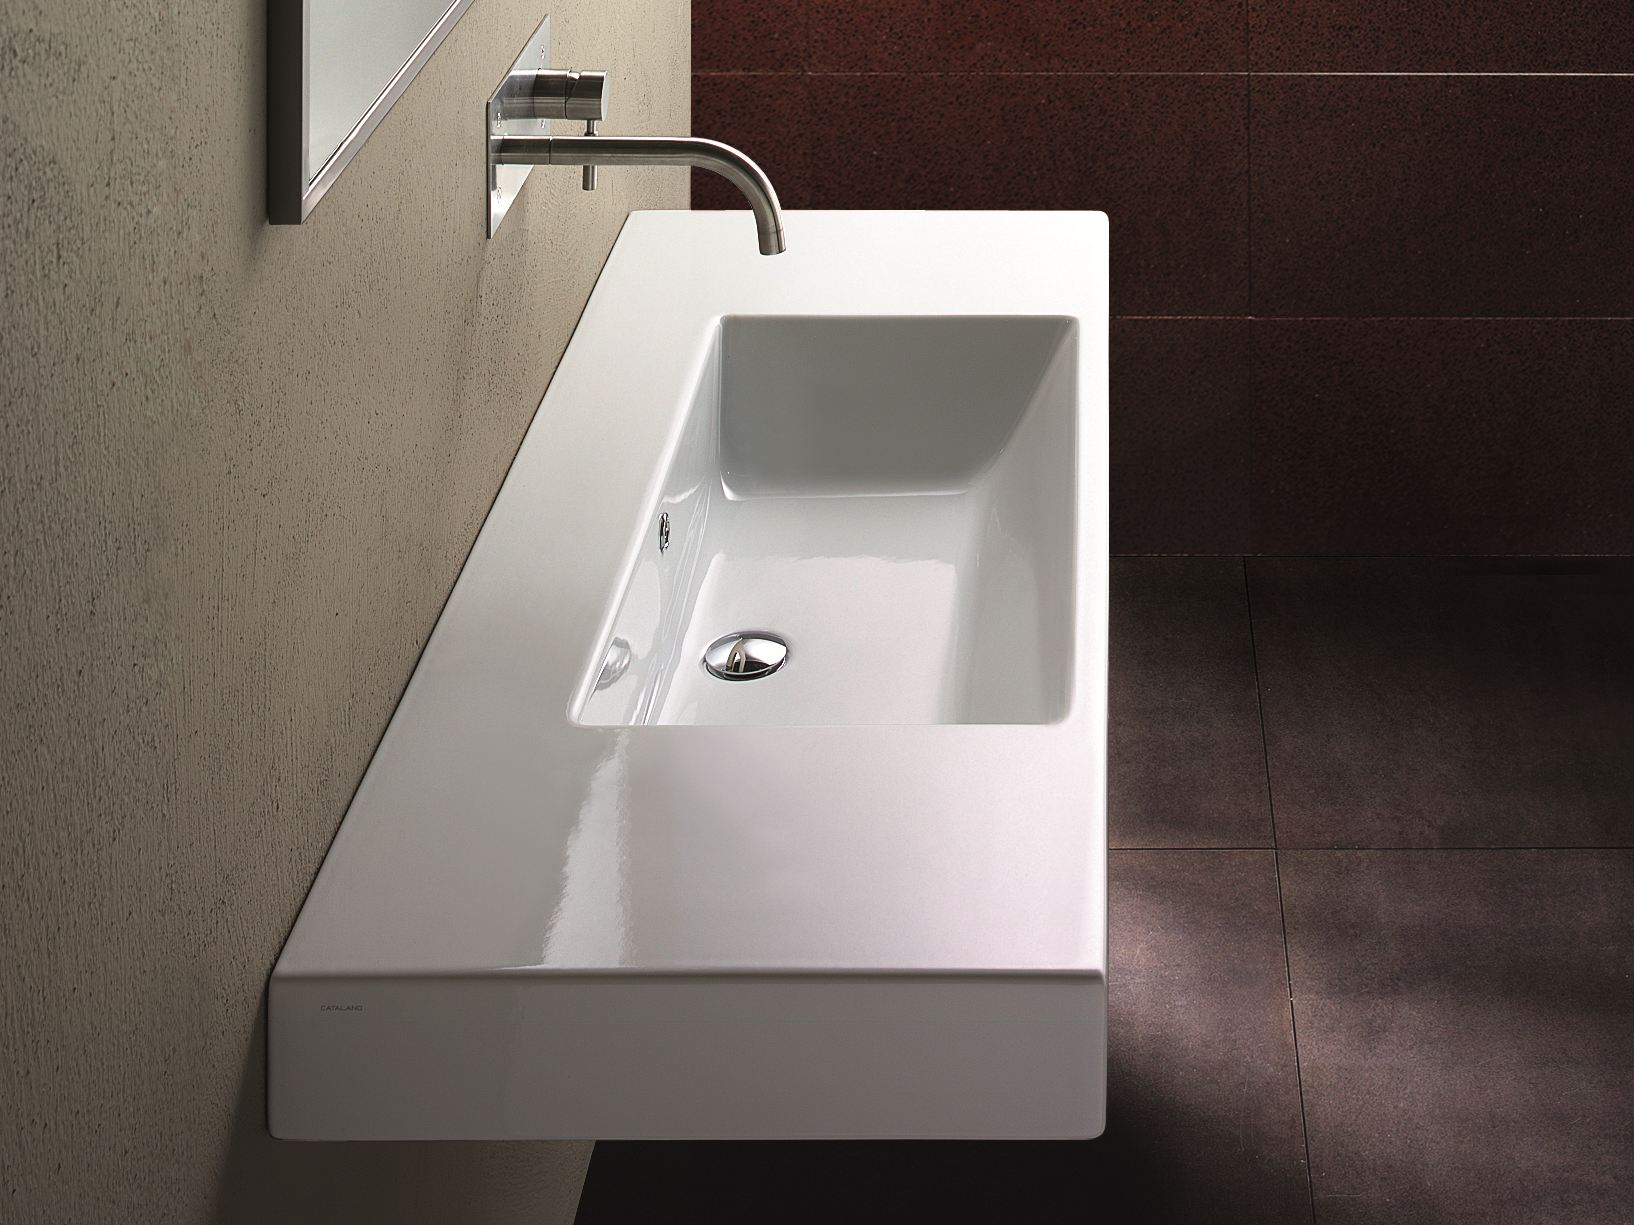 zero domino 125 waschbecken by ceramica catalano. Black Bedroom Furniture Sets. Home Design Ideas